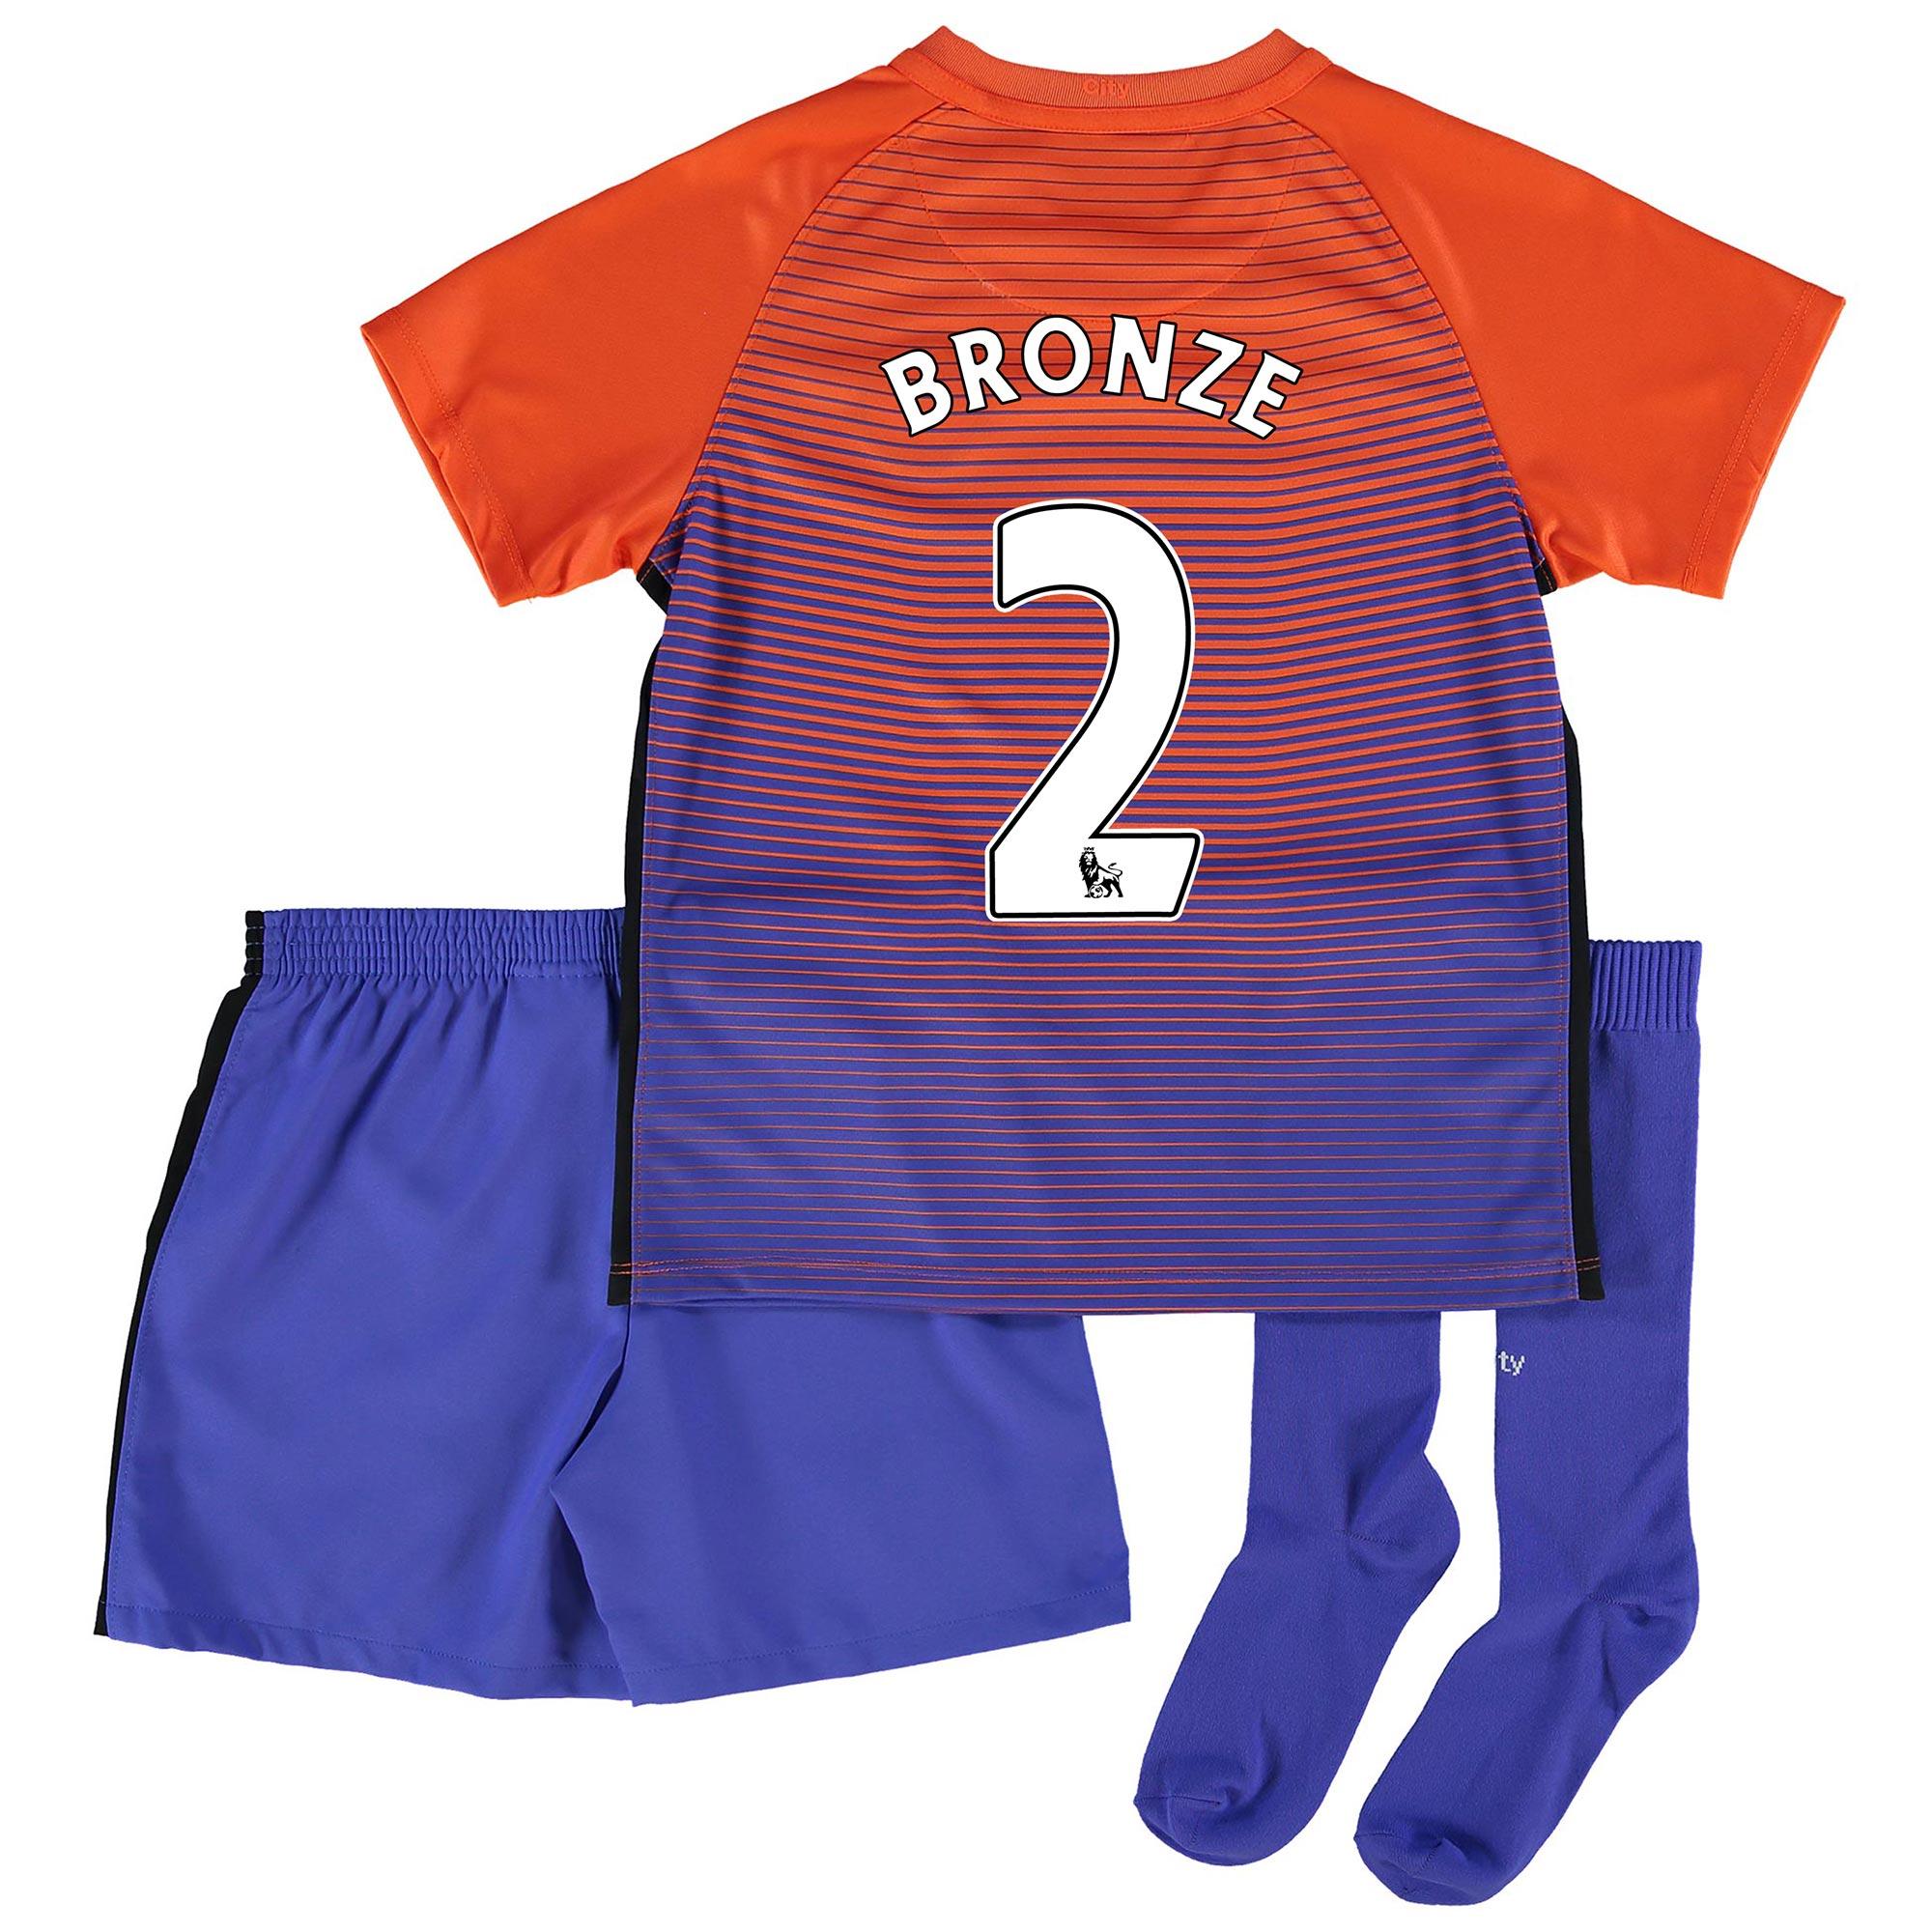 Manchester City Third Stadium Kit 2016-17 - Little Kids with Bronze 2